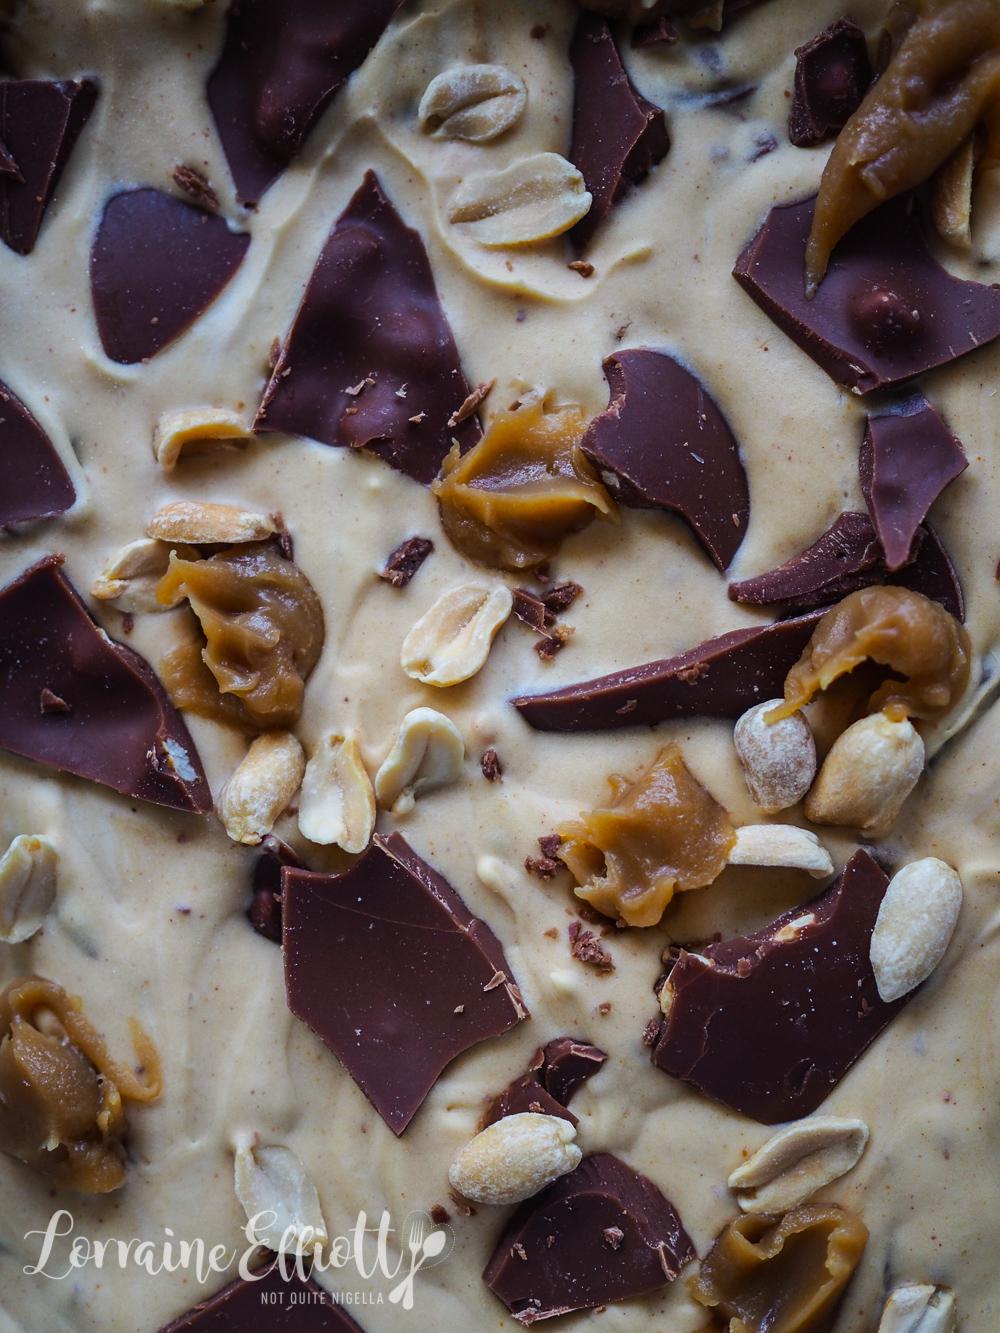 Peanut Butter & Chunky Chocolate Chip Ice Cream